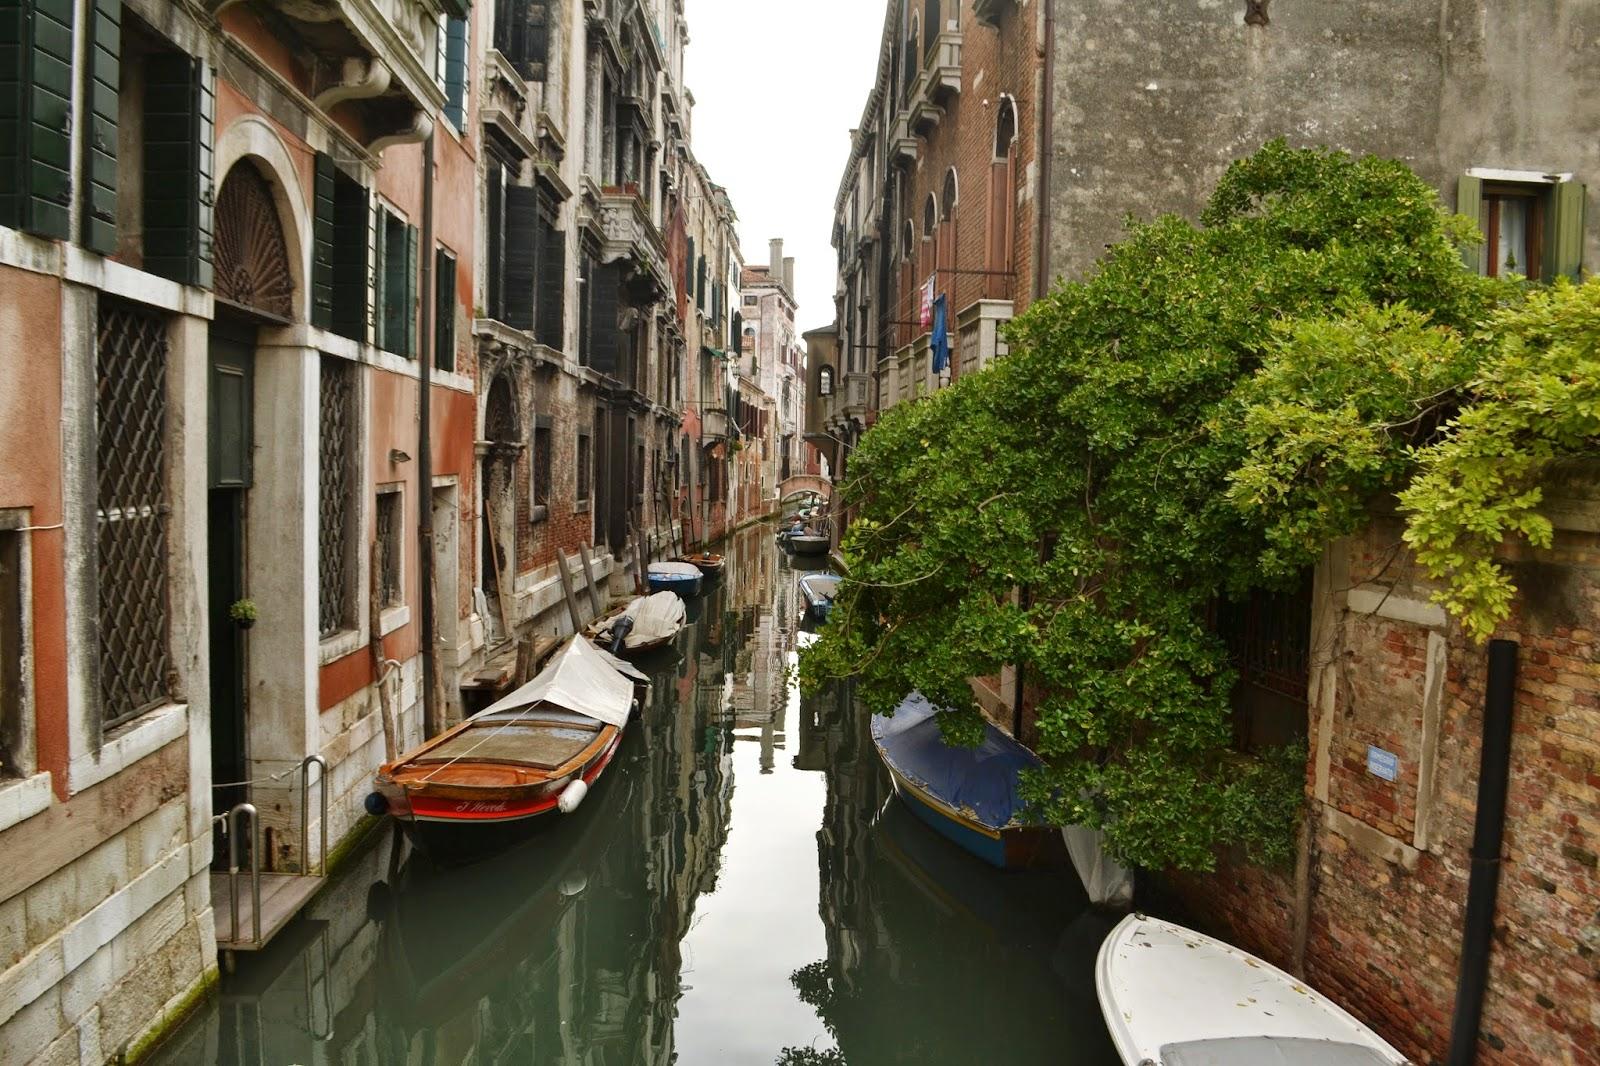 Venice, Italy, venezia, canals , europe, gondola, St mark's square